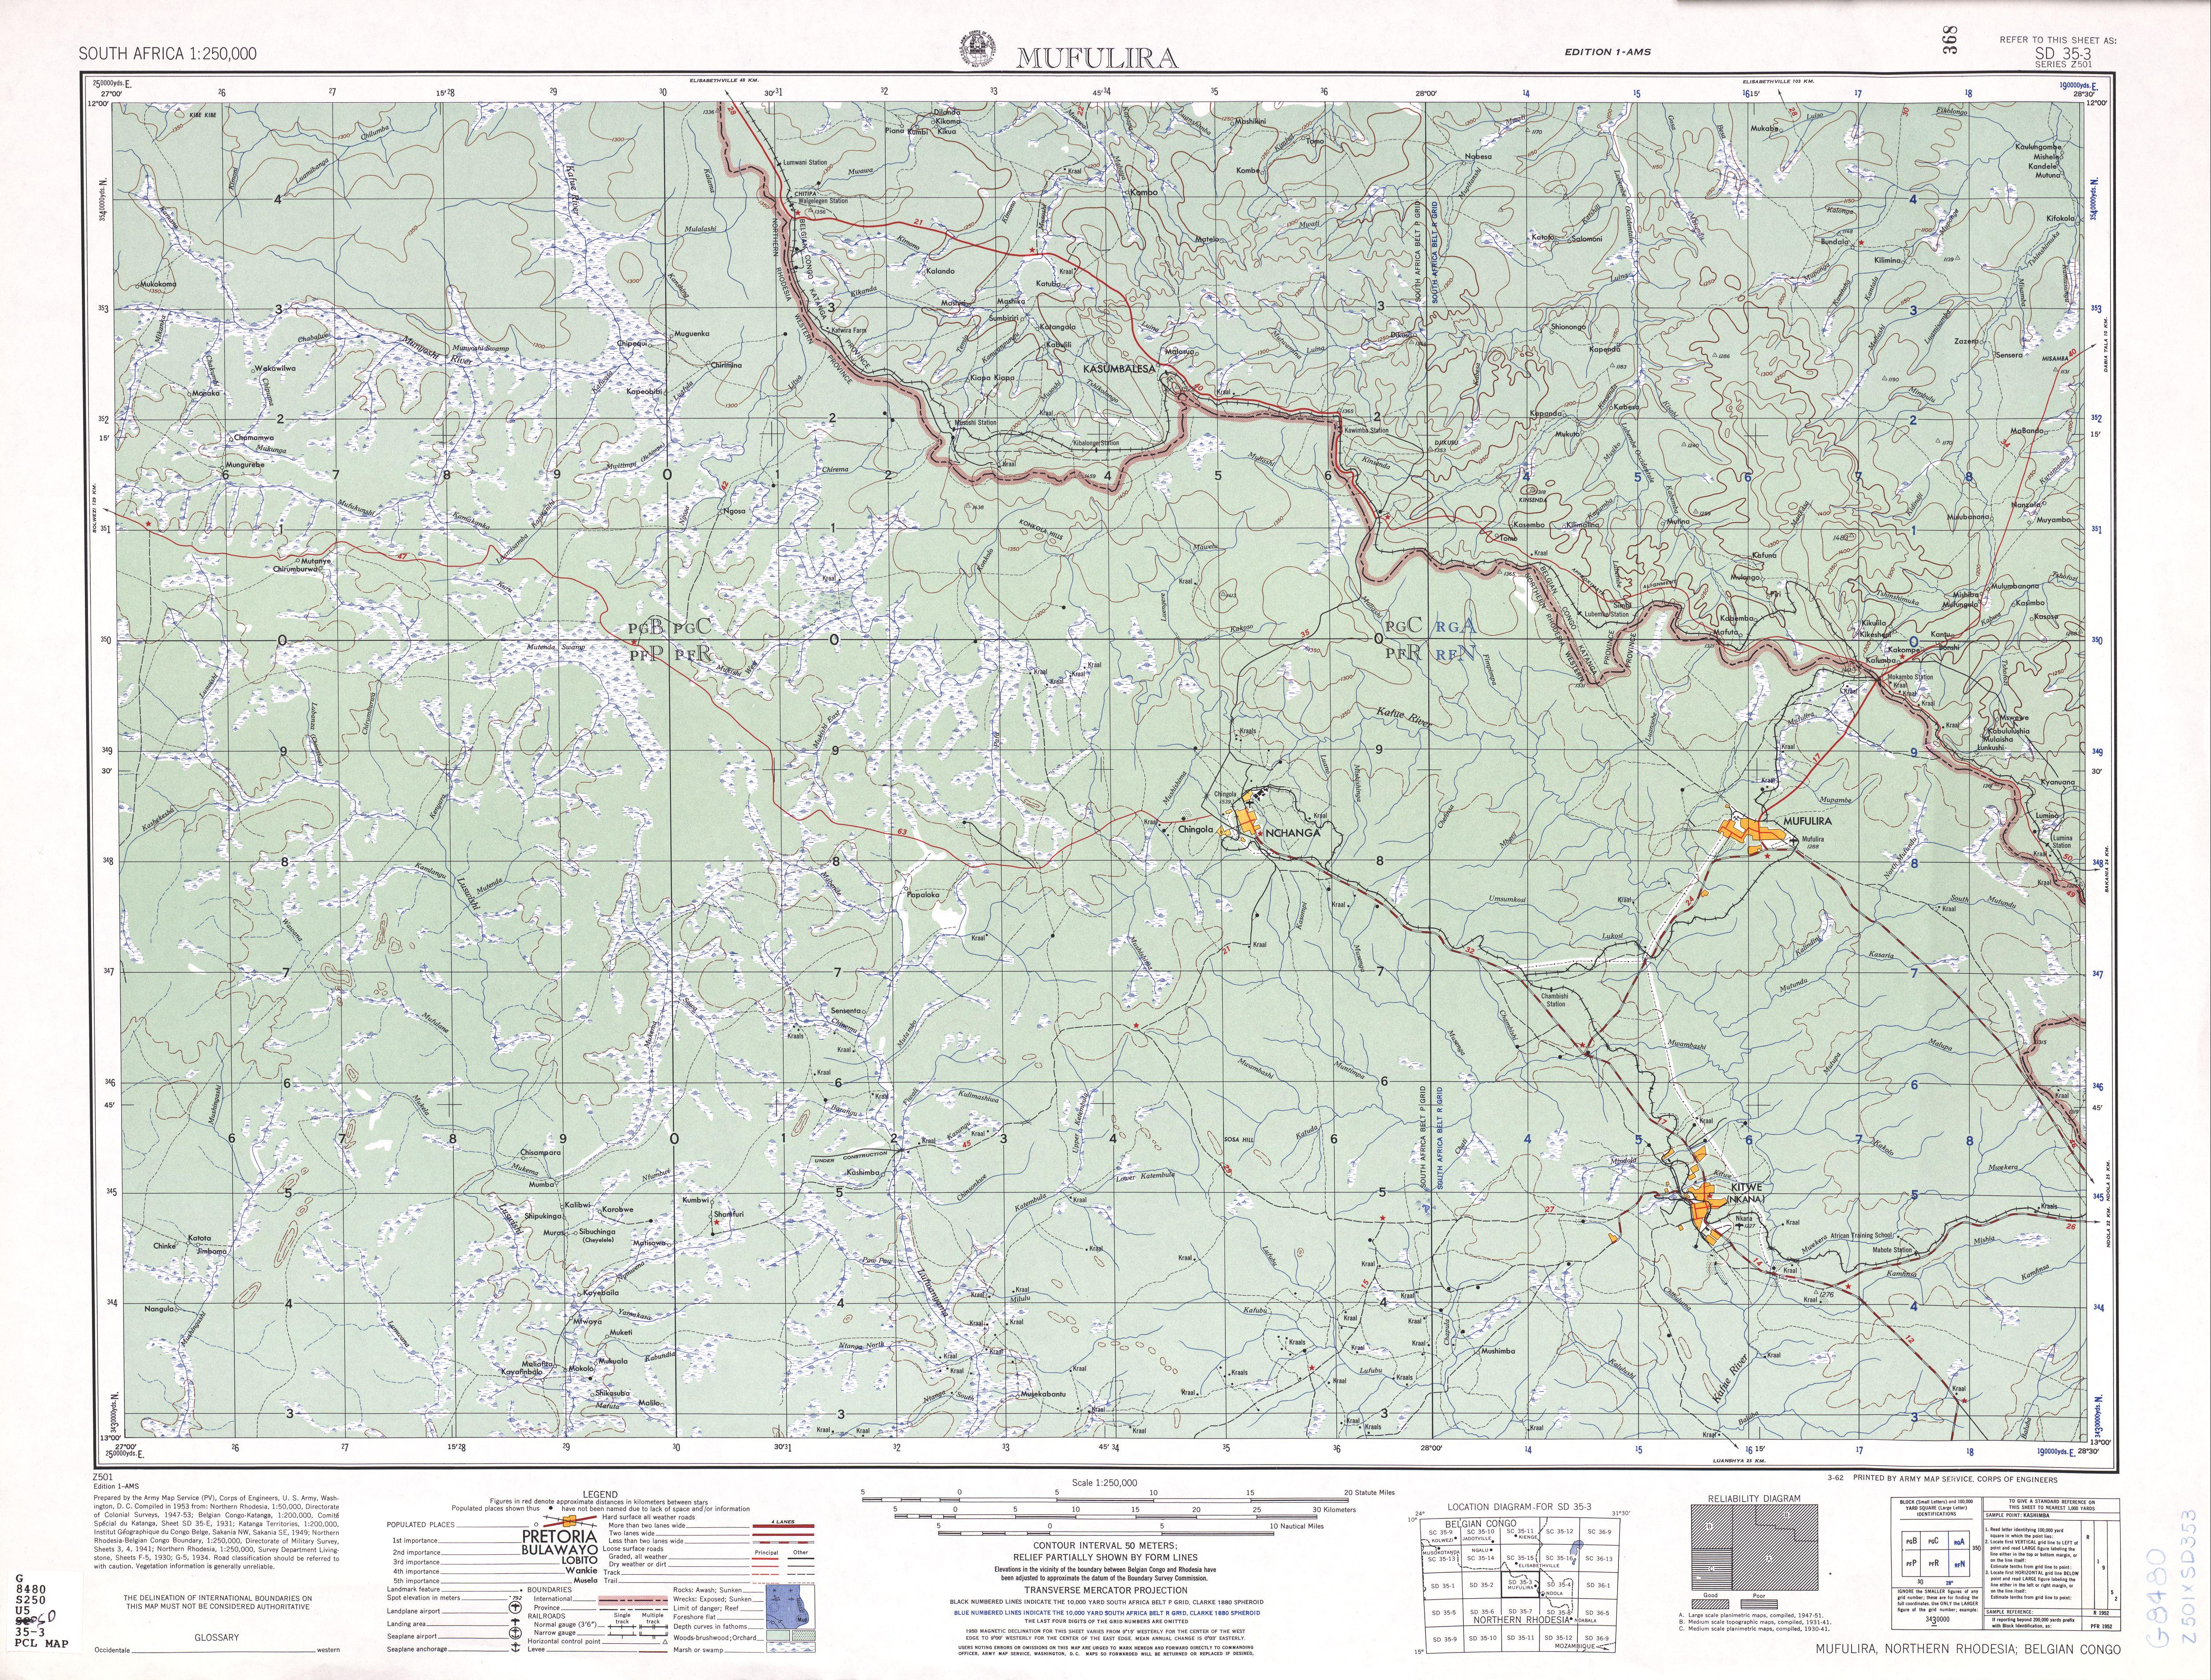 Hoja Mufulira del Mapa Topográfico de África Meridional 1954